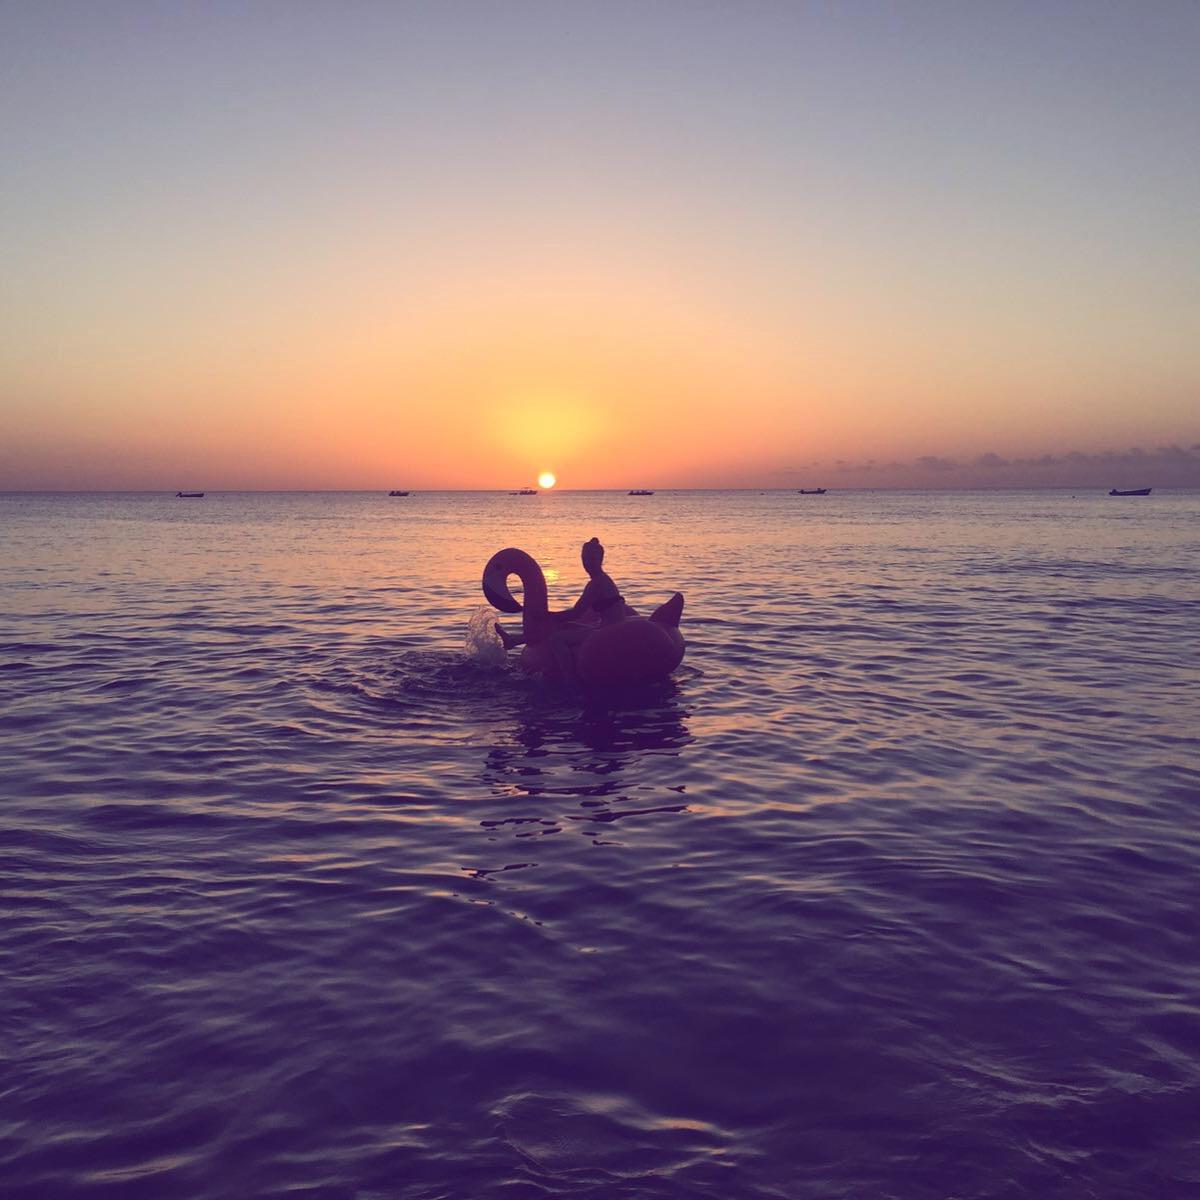 Sunset in Barbados